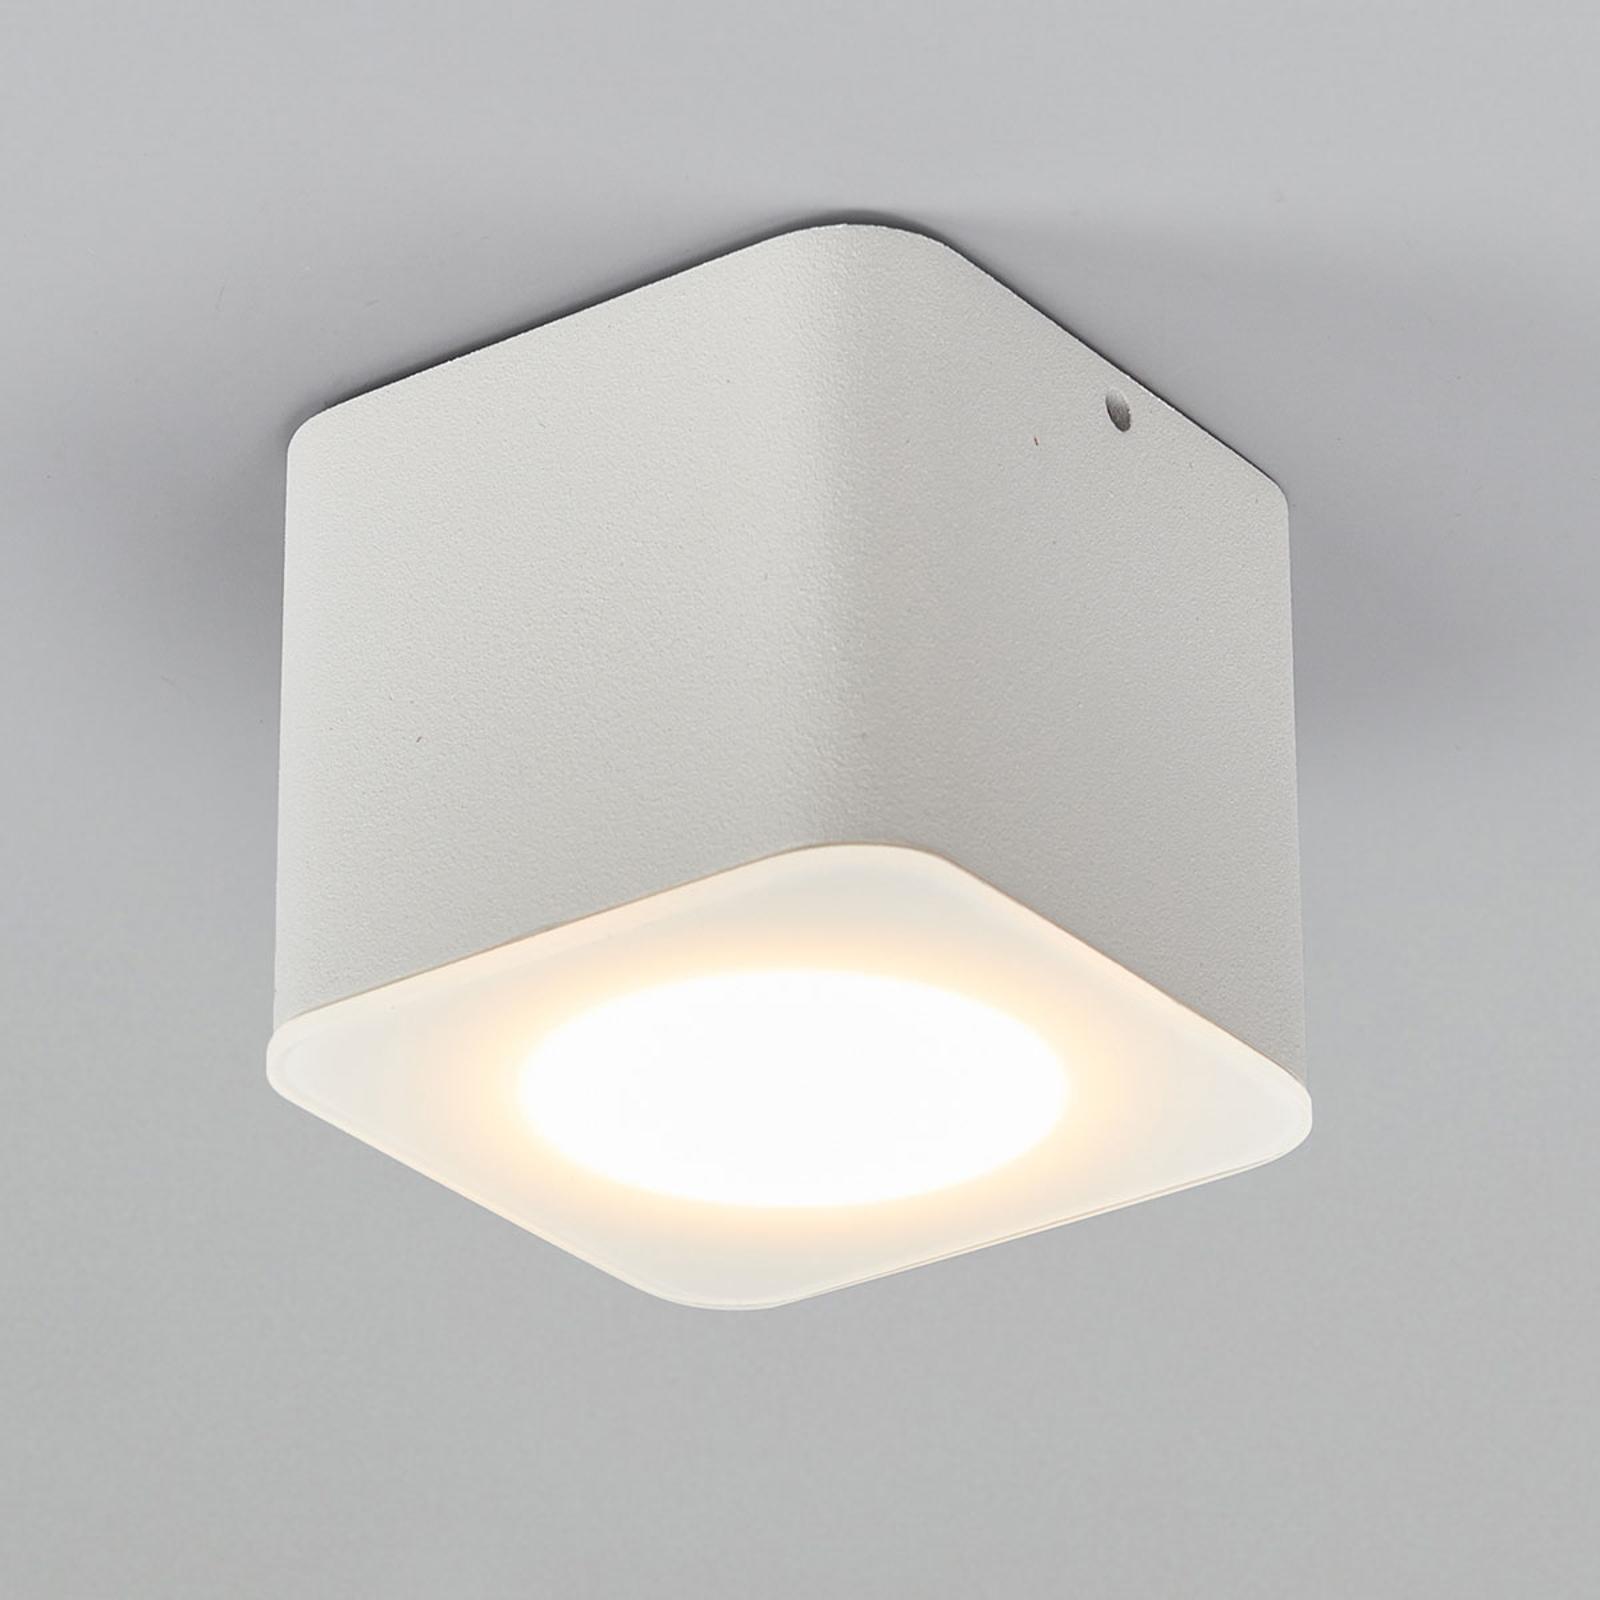 Helestra Oso spot LED angolare, bianco satinato